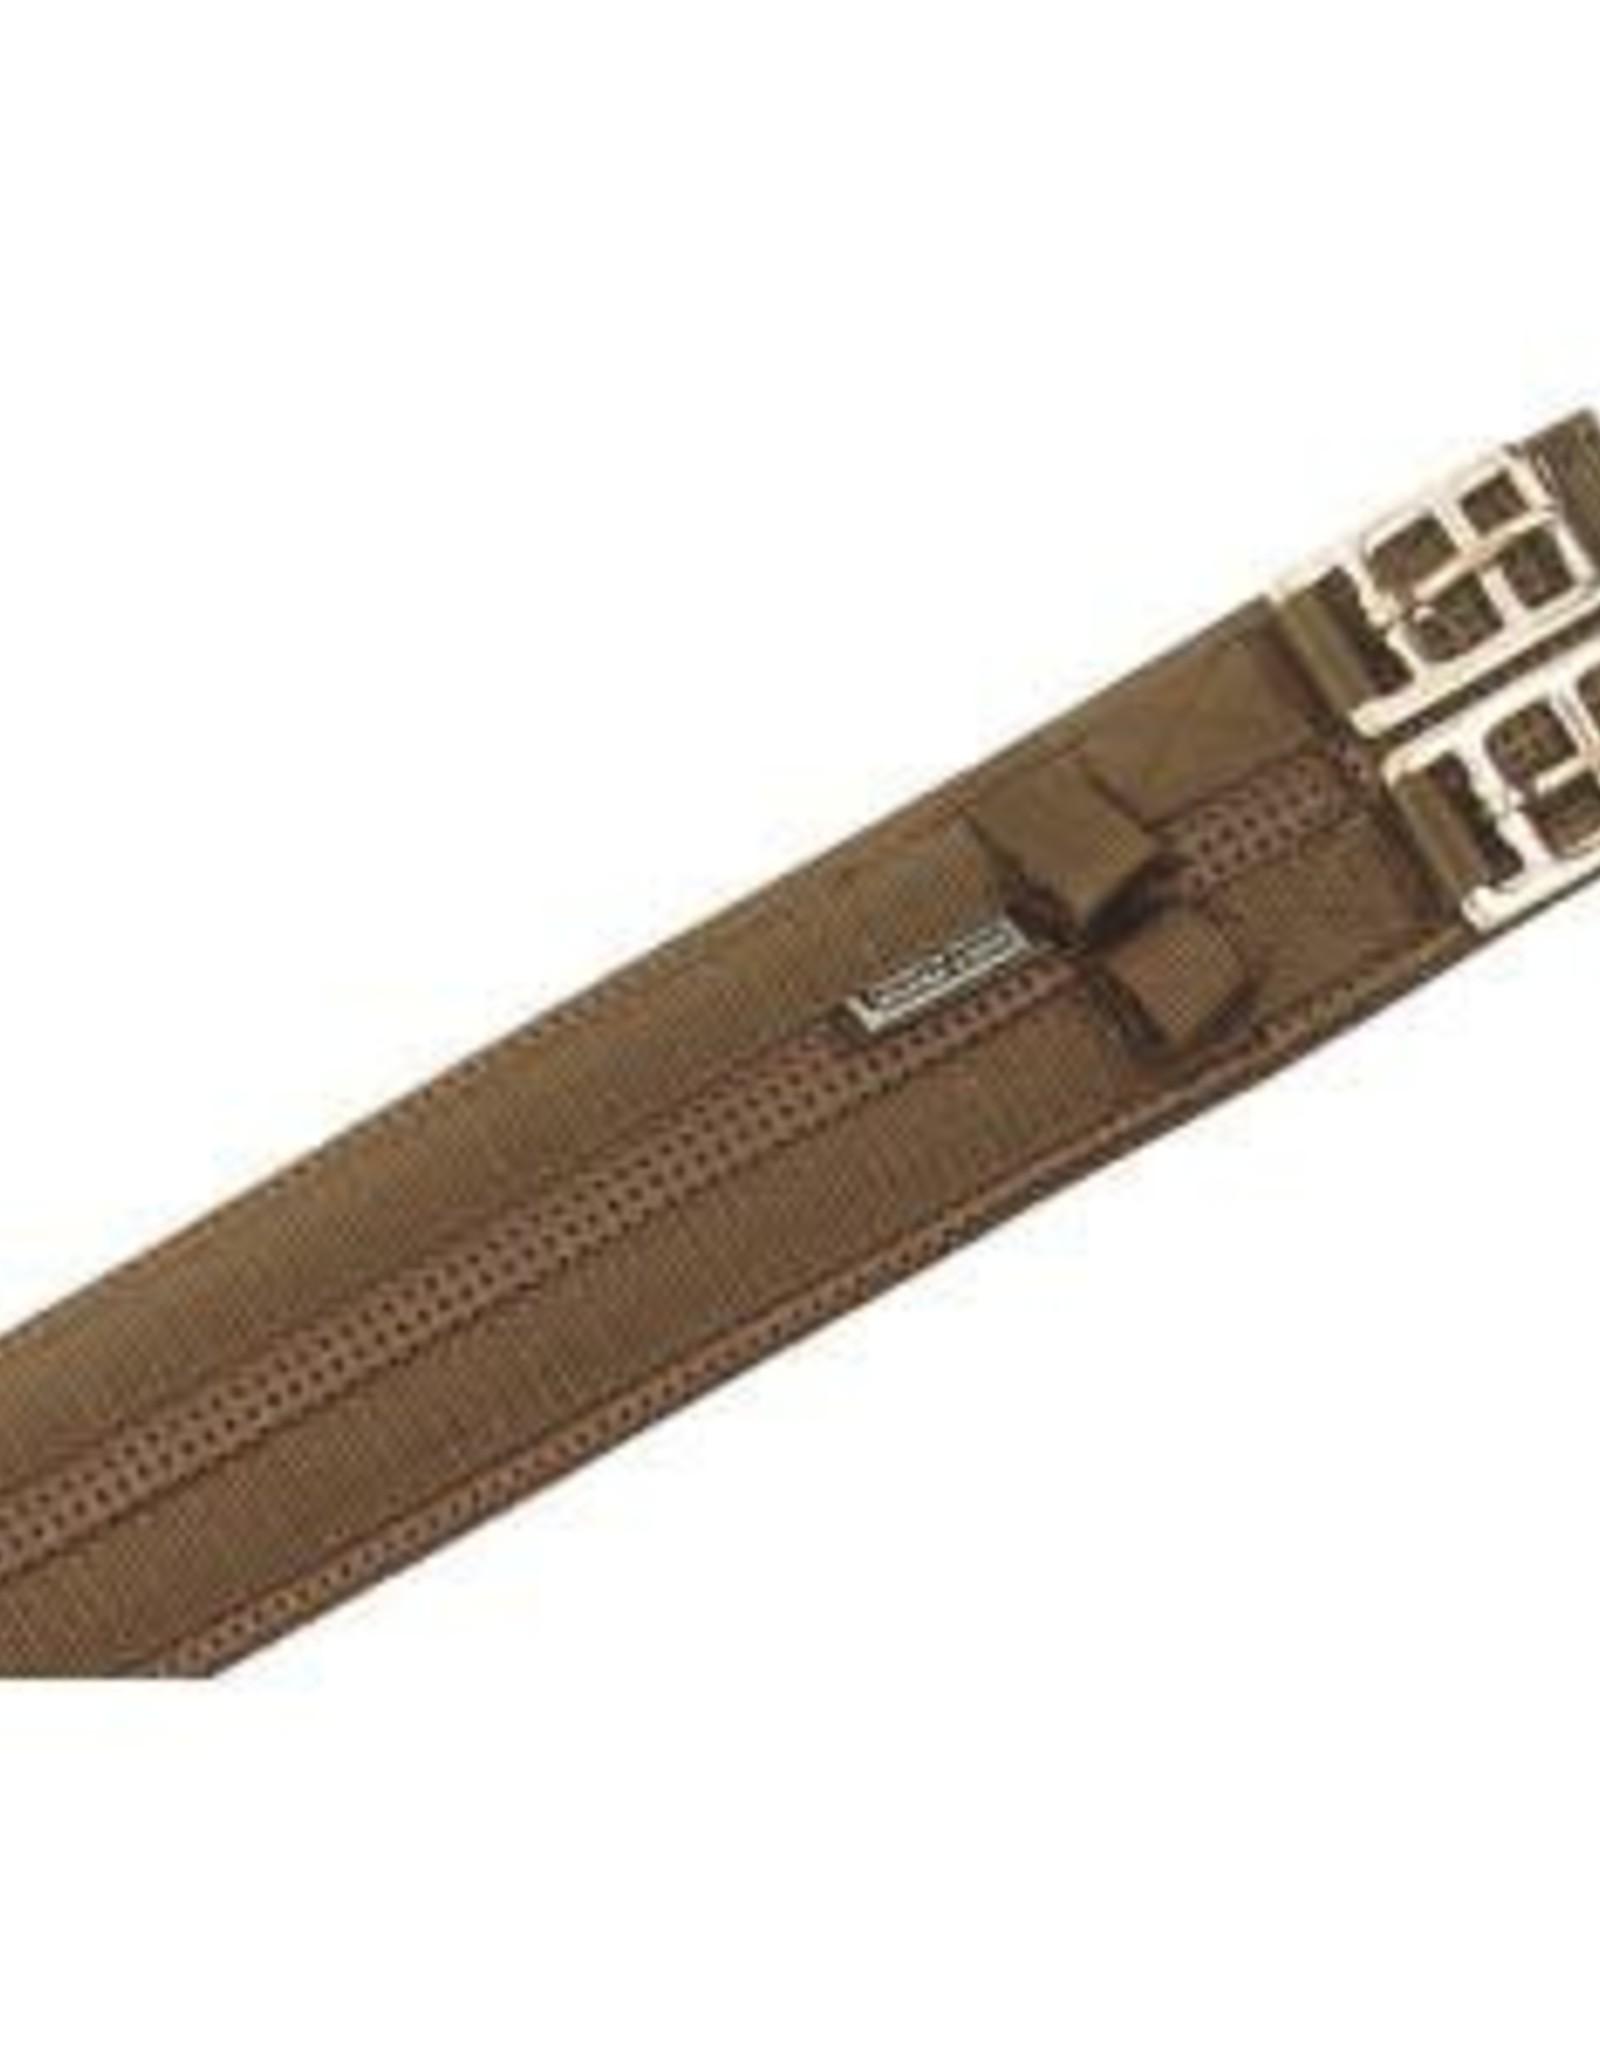 Equi-Prene Lonsdale Anti-Gall Girth - Brown - 45cm